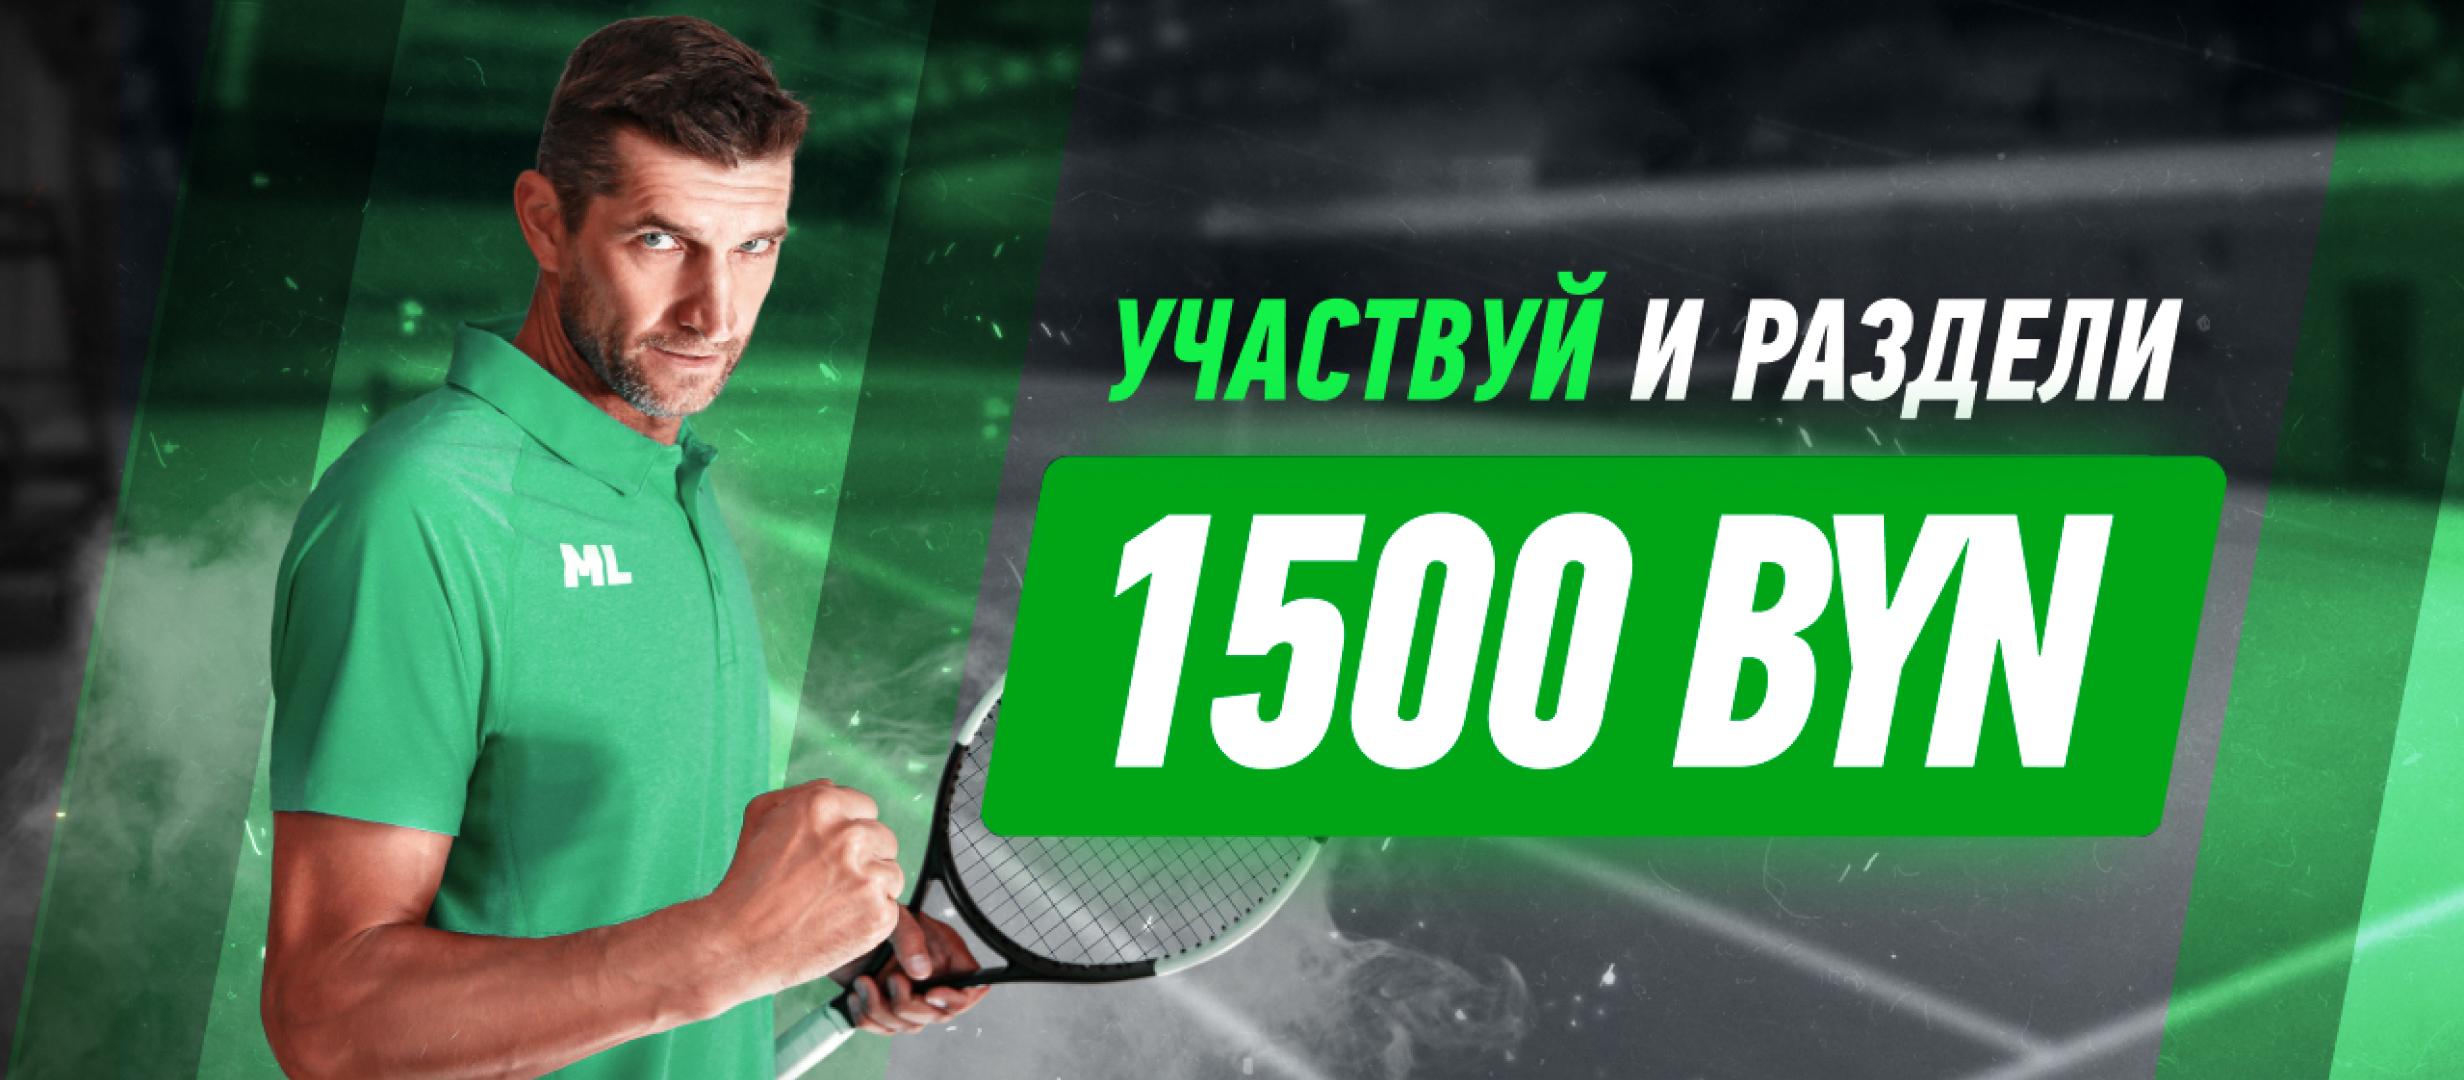 Кеш-бонус от Maxline 350 руб..